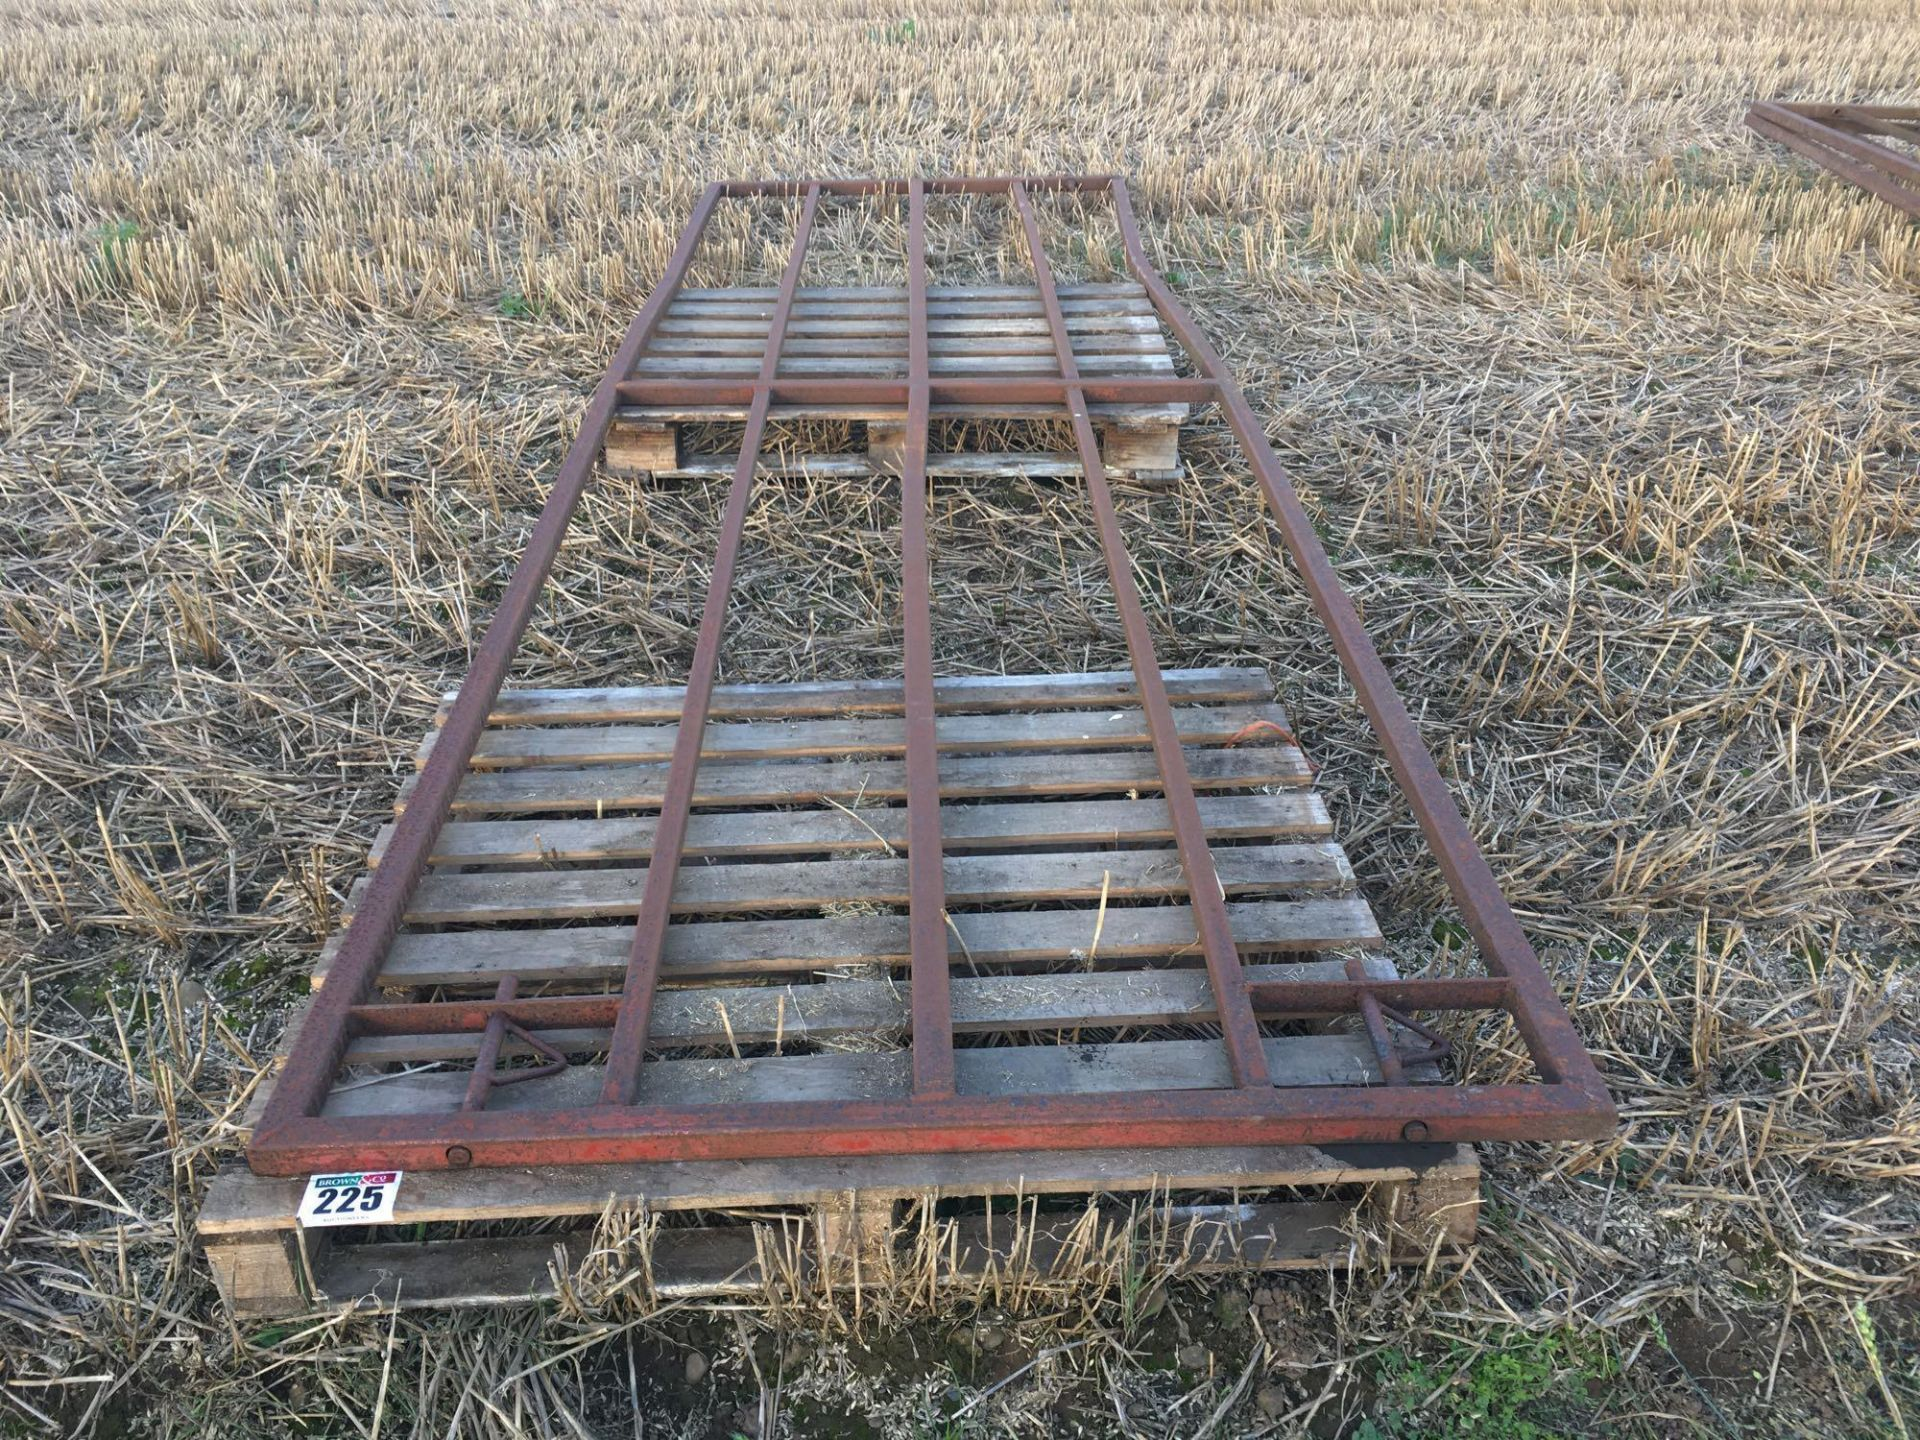 1x 13.5ft (4.1m) barrier